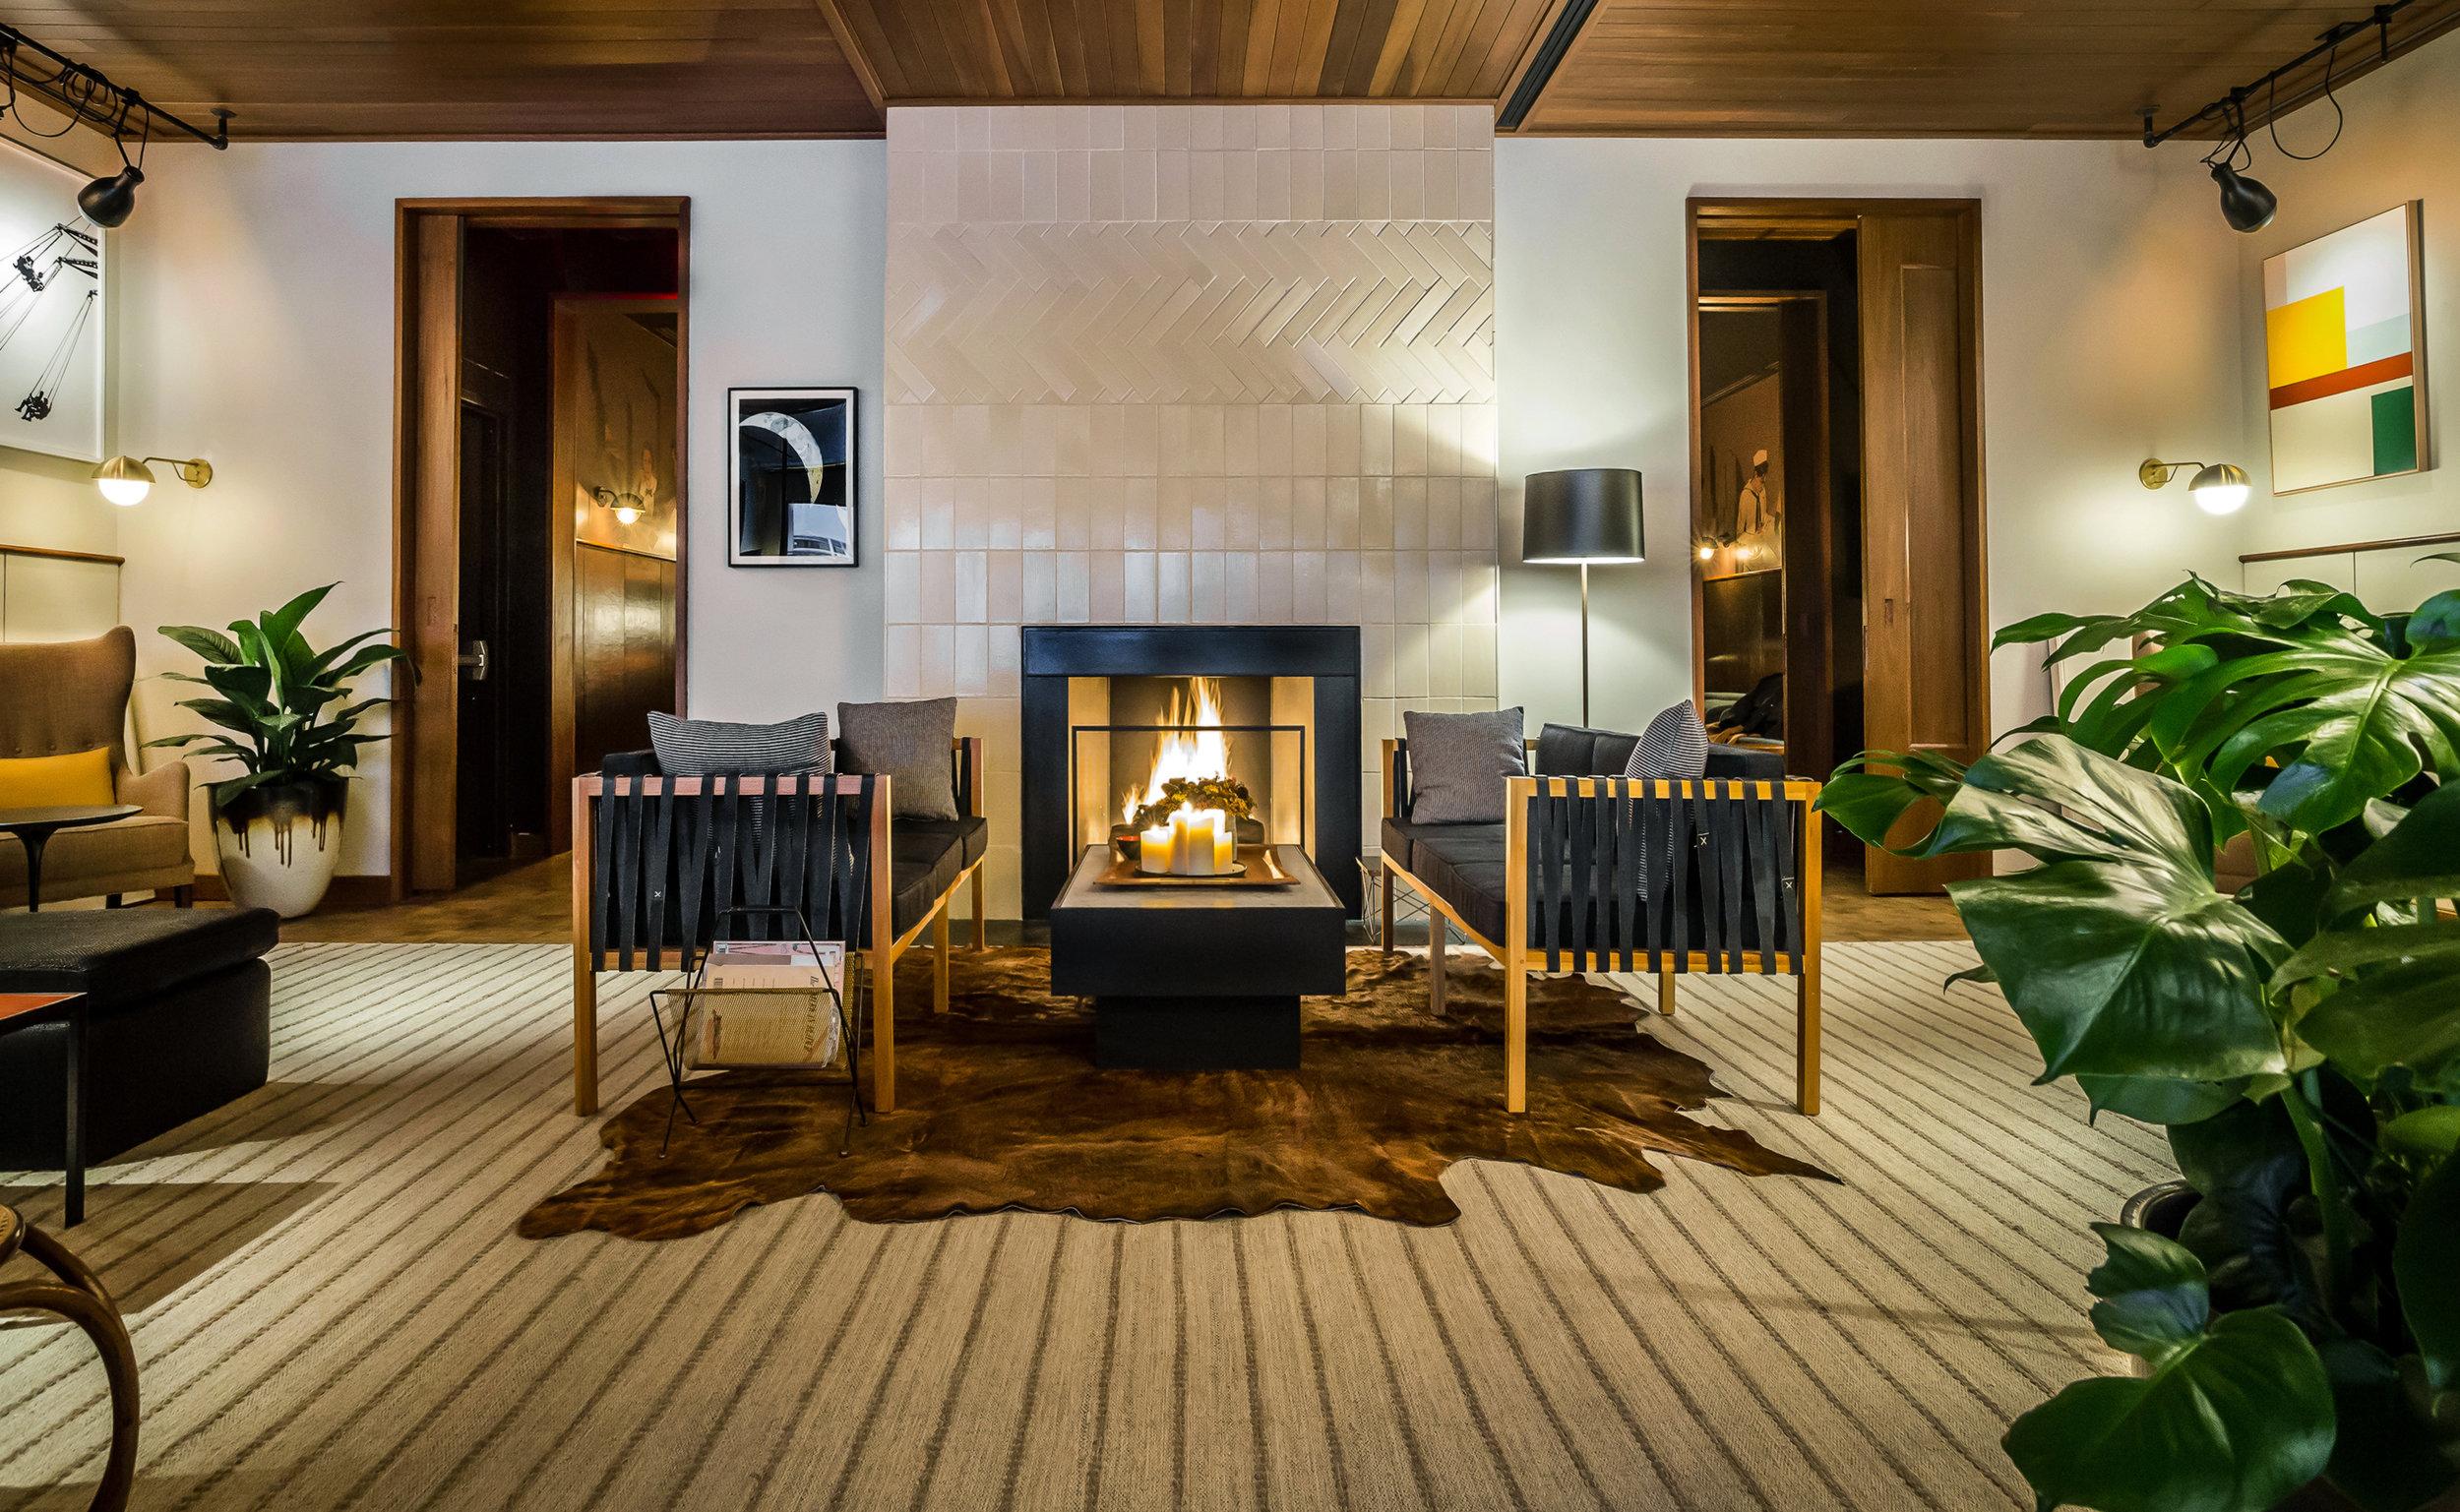 nrm_1418770875-01-tnc-best-restaurant-fireplaces-the-smyth-noah-fecks.jpg